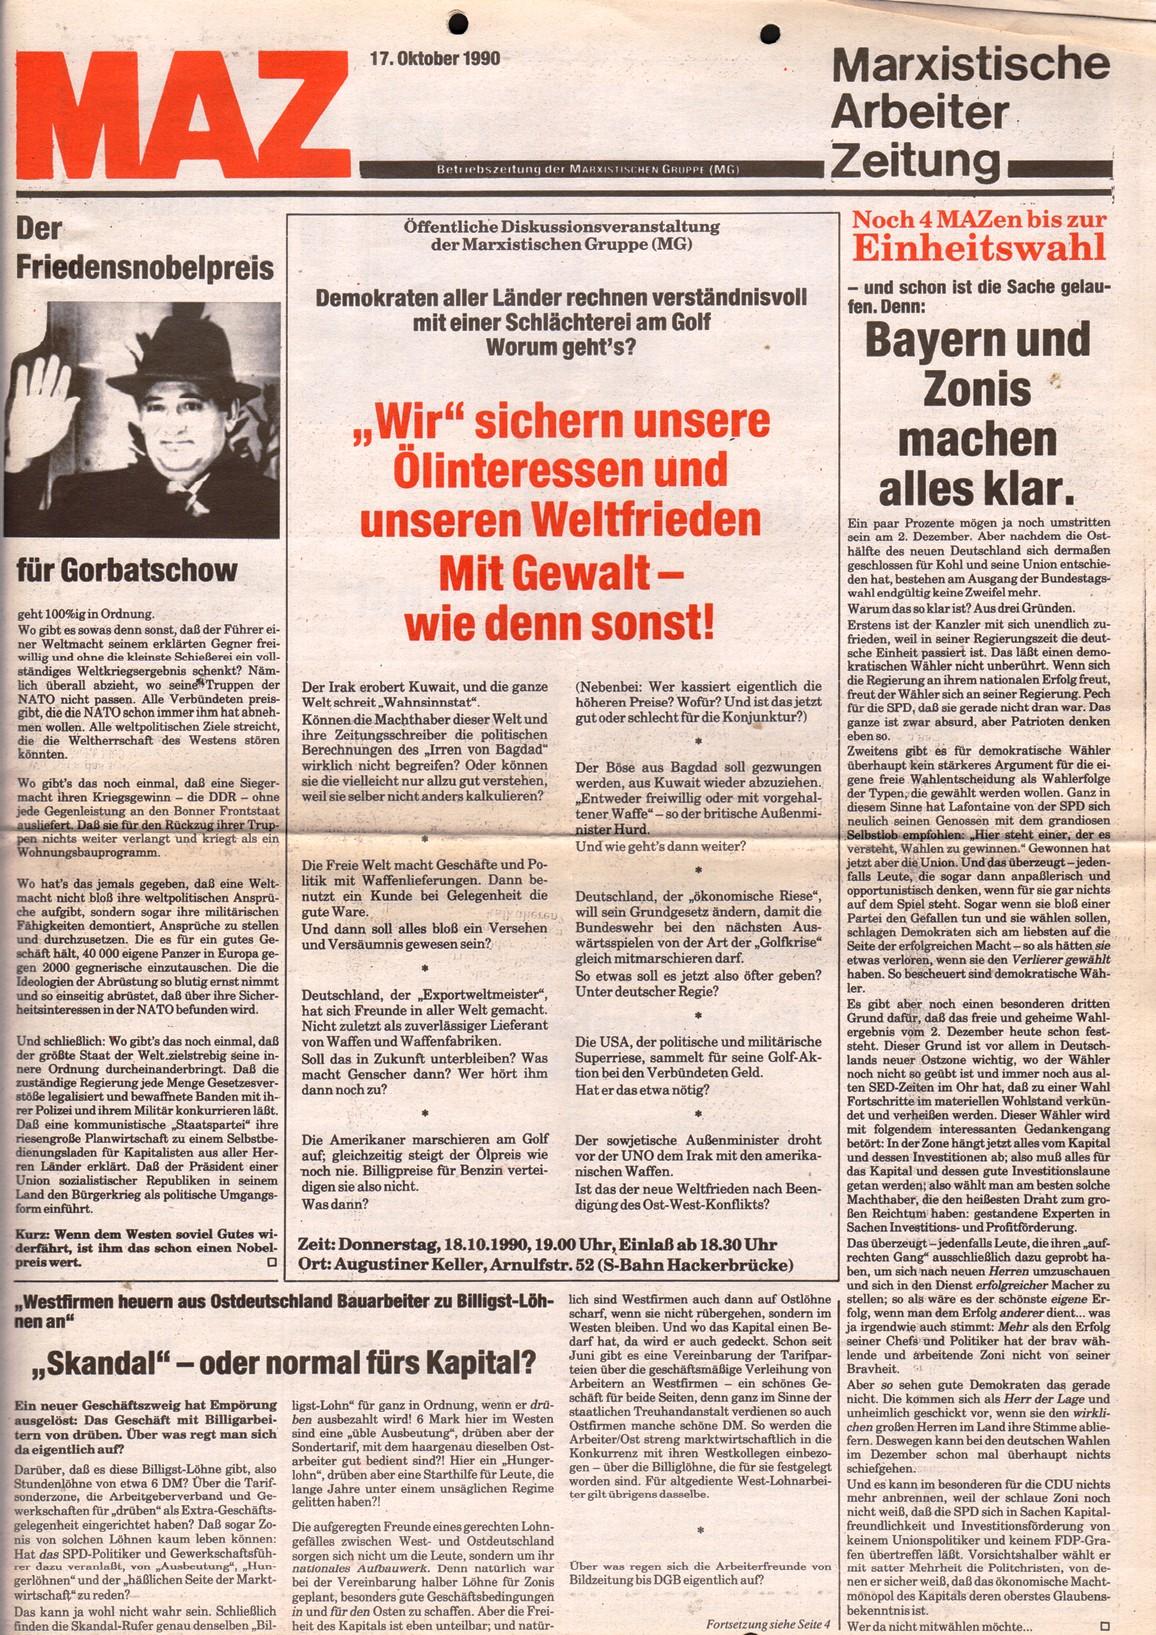 Muenchen_MG_MAZ_19901017_01